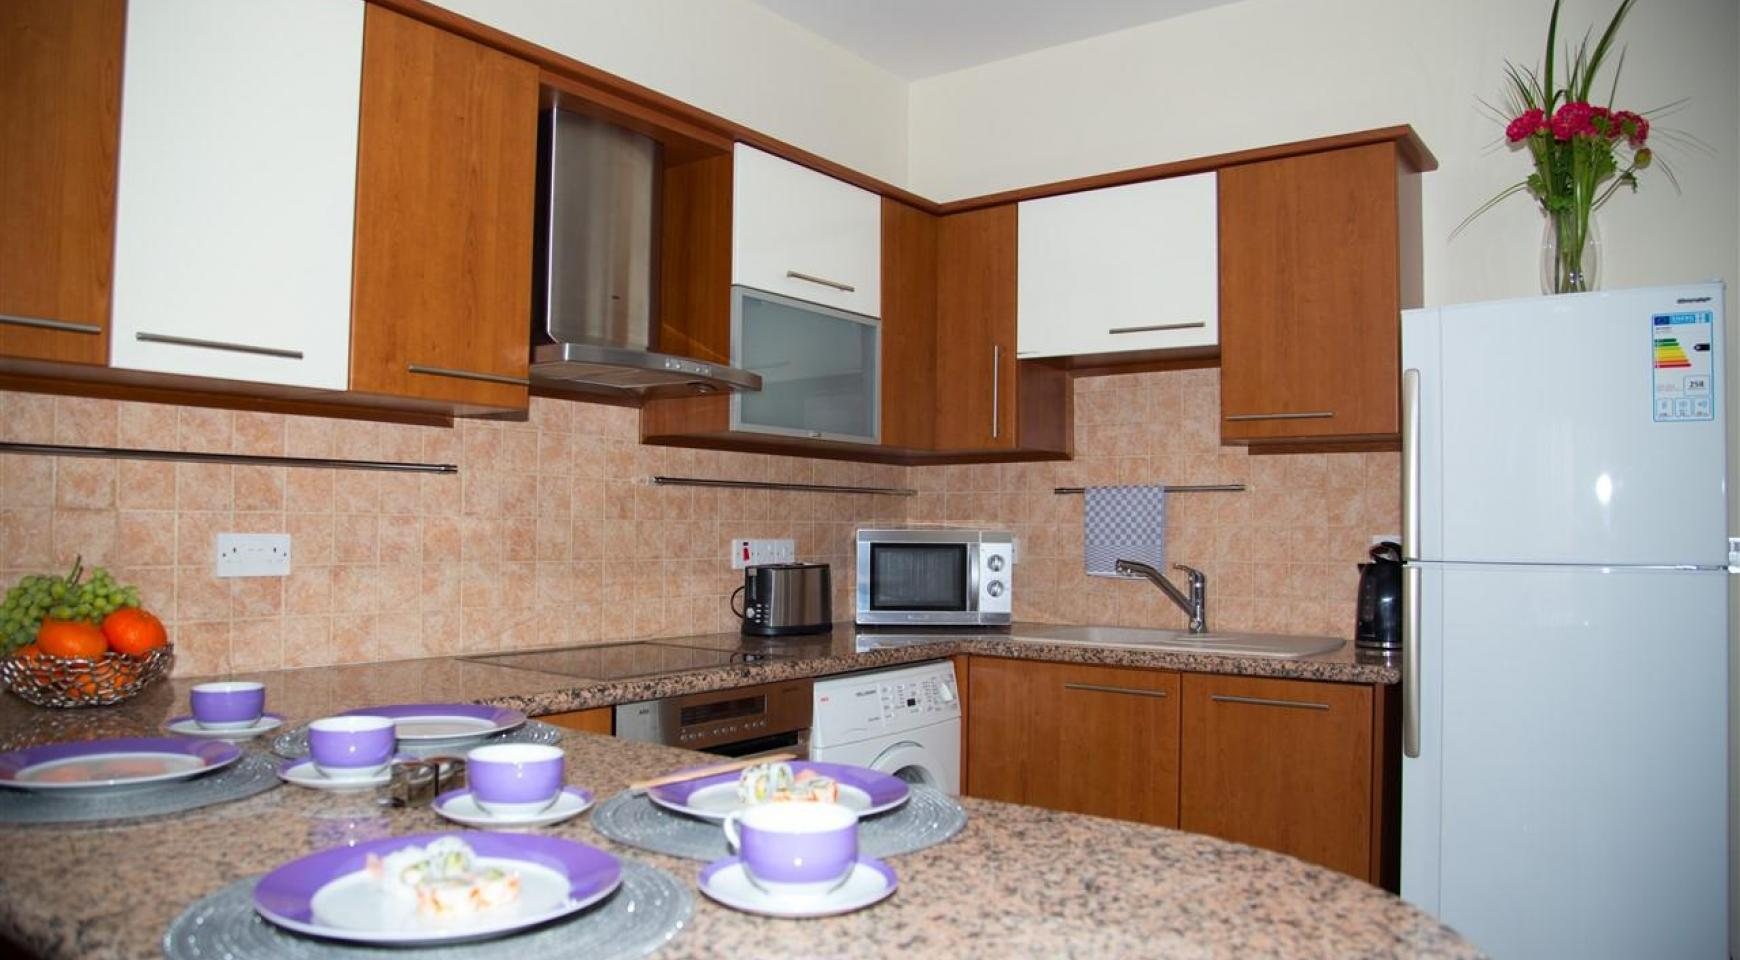 Luxury 2 Bedroom Apartment Mesogios Iris 304 in the Tourist area near the Beach - 12